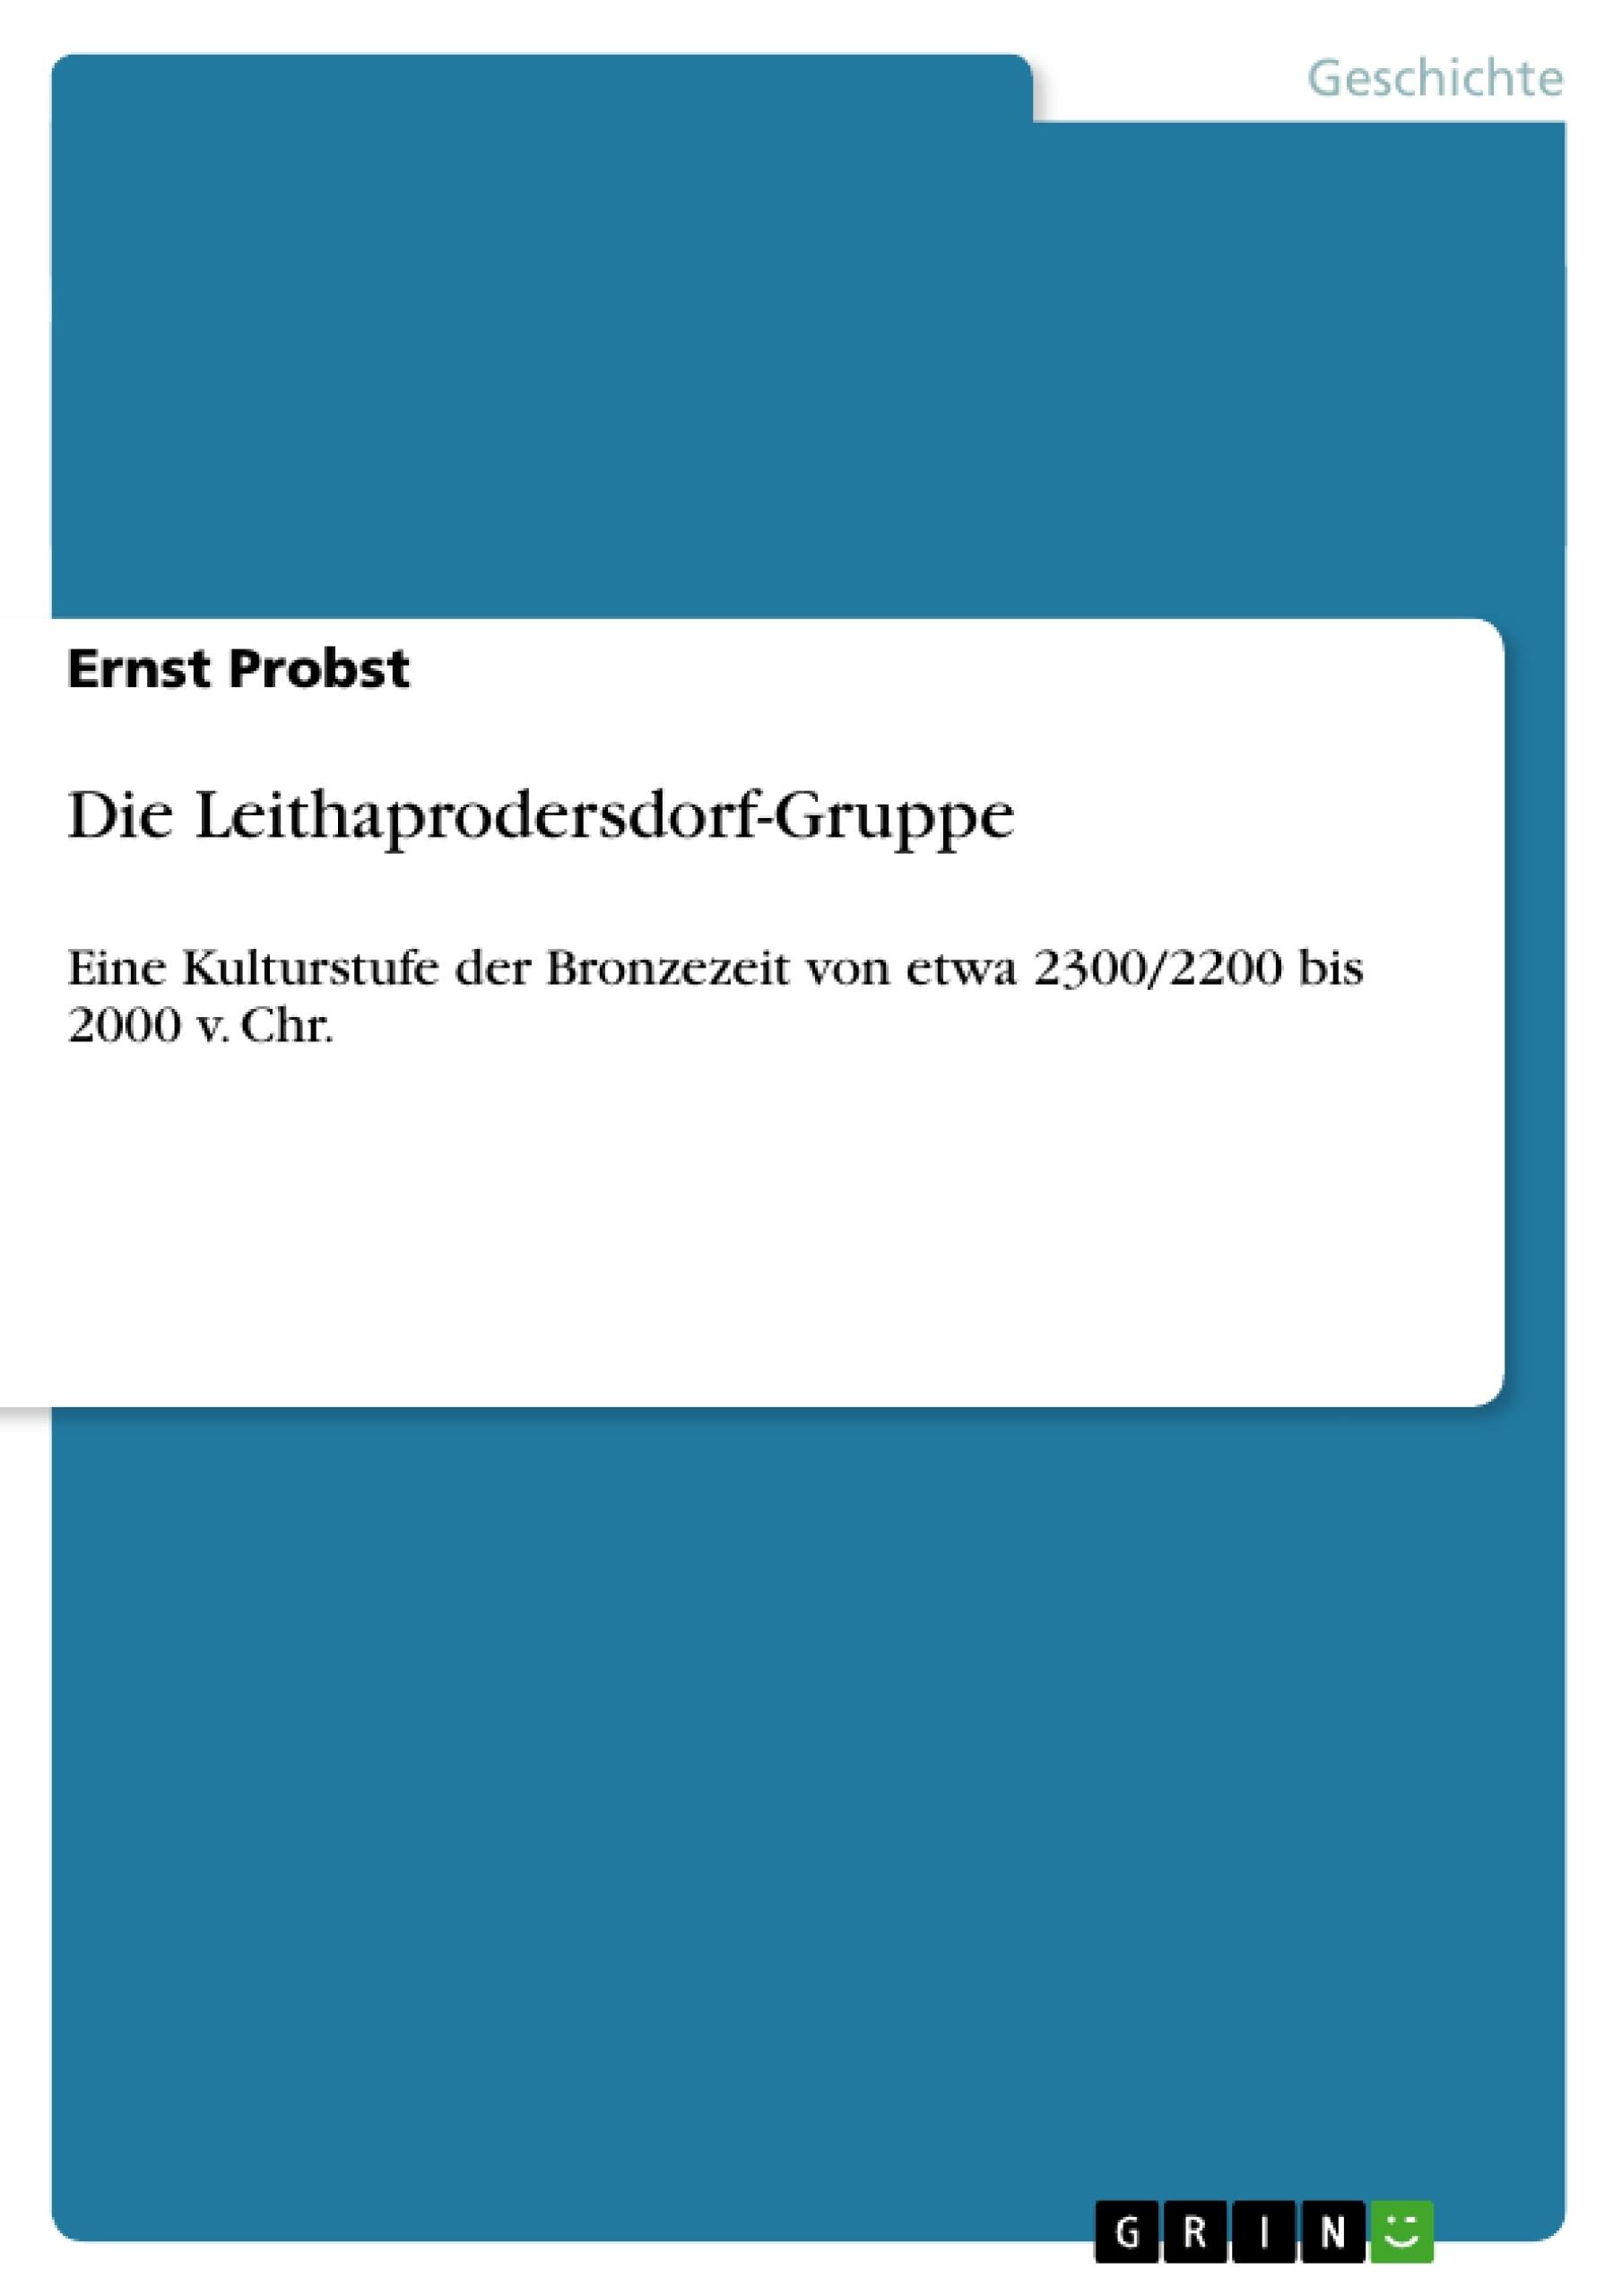 Titel: Die Leithaprodersdorf-Gruppe